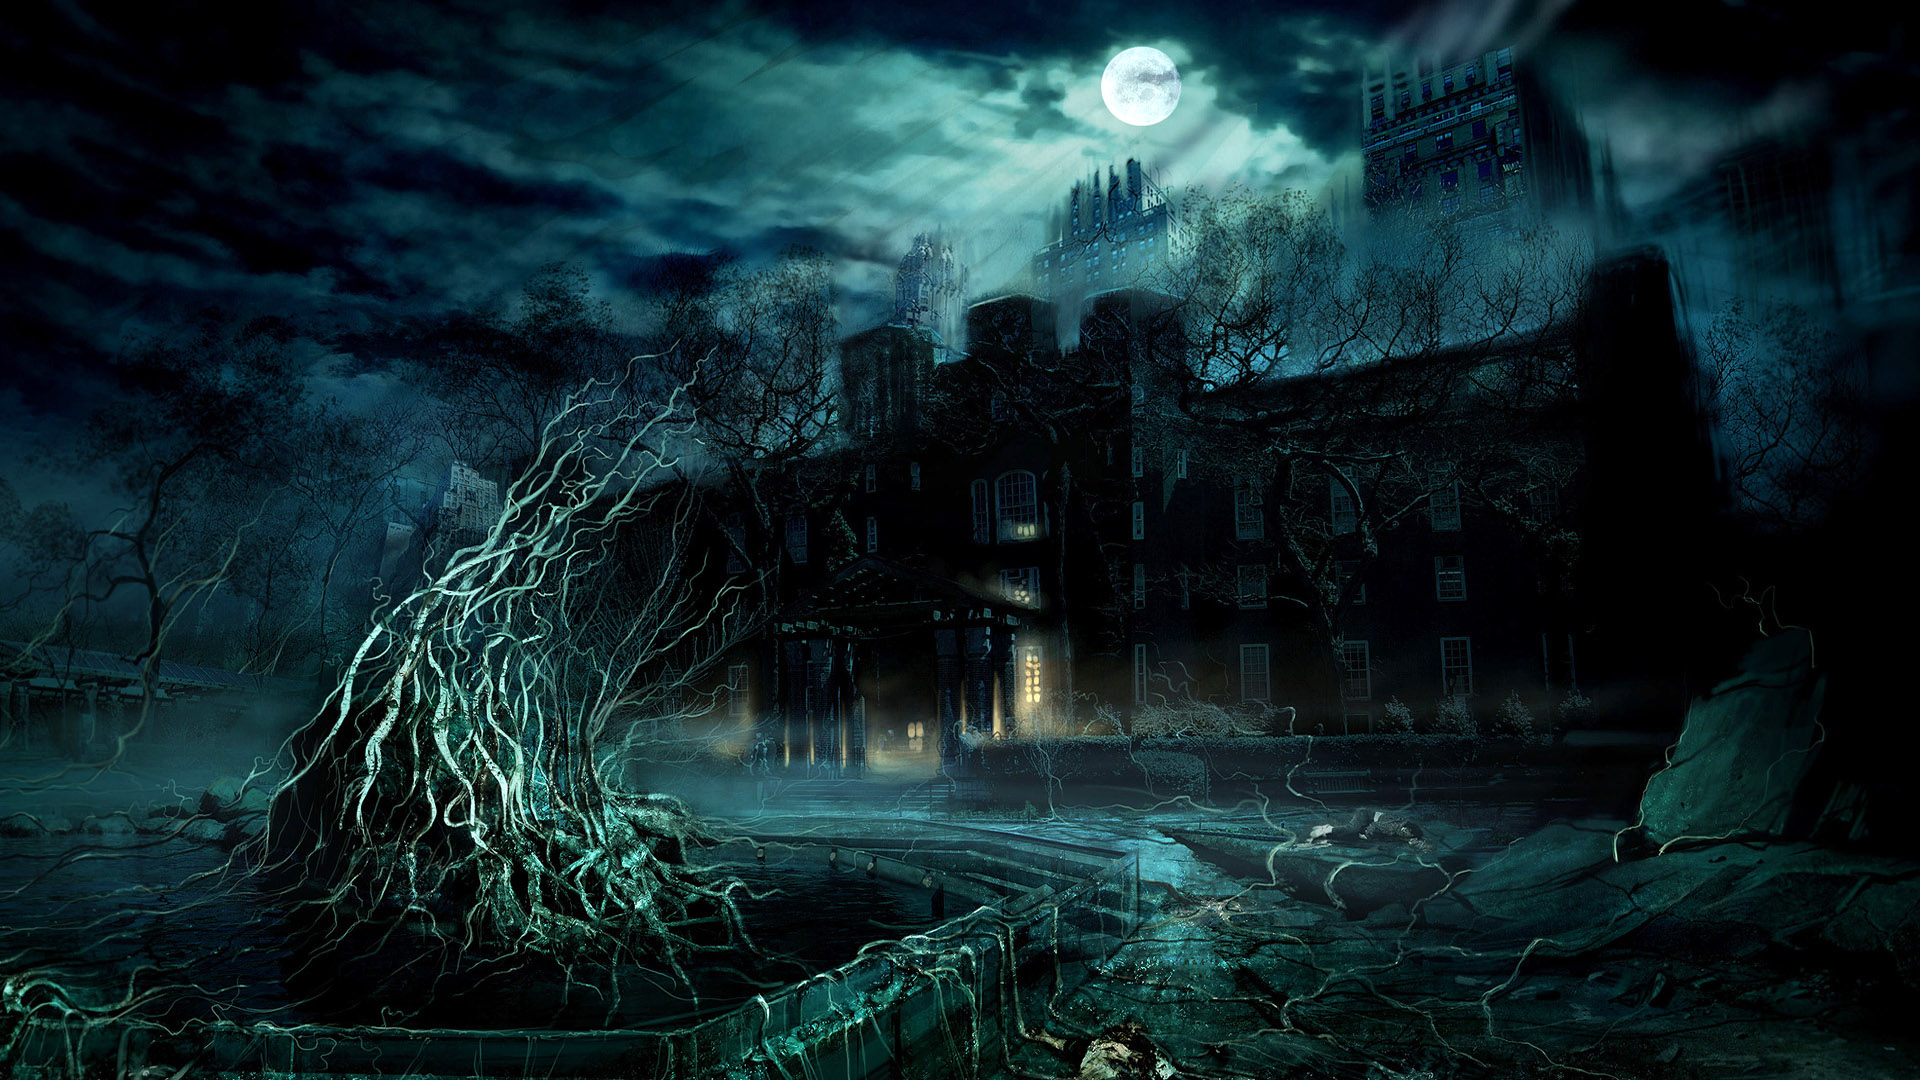 Download Dark Game Scene Hd Wallpapers 1080p 1920x1080